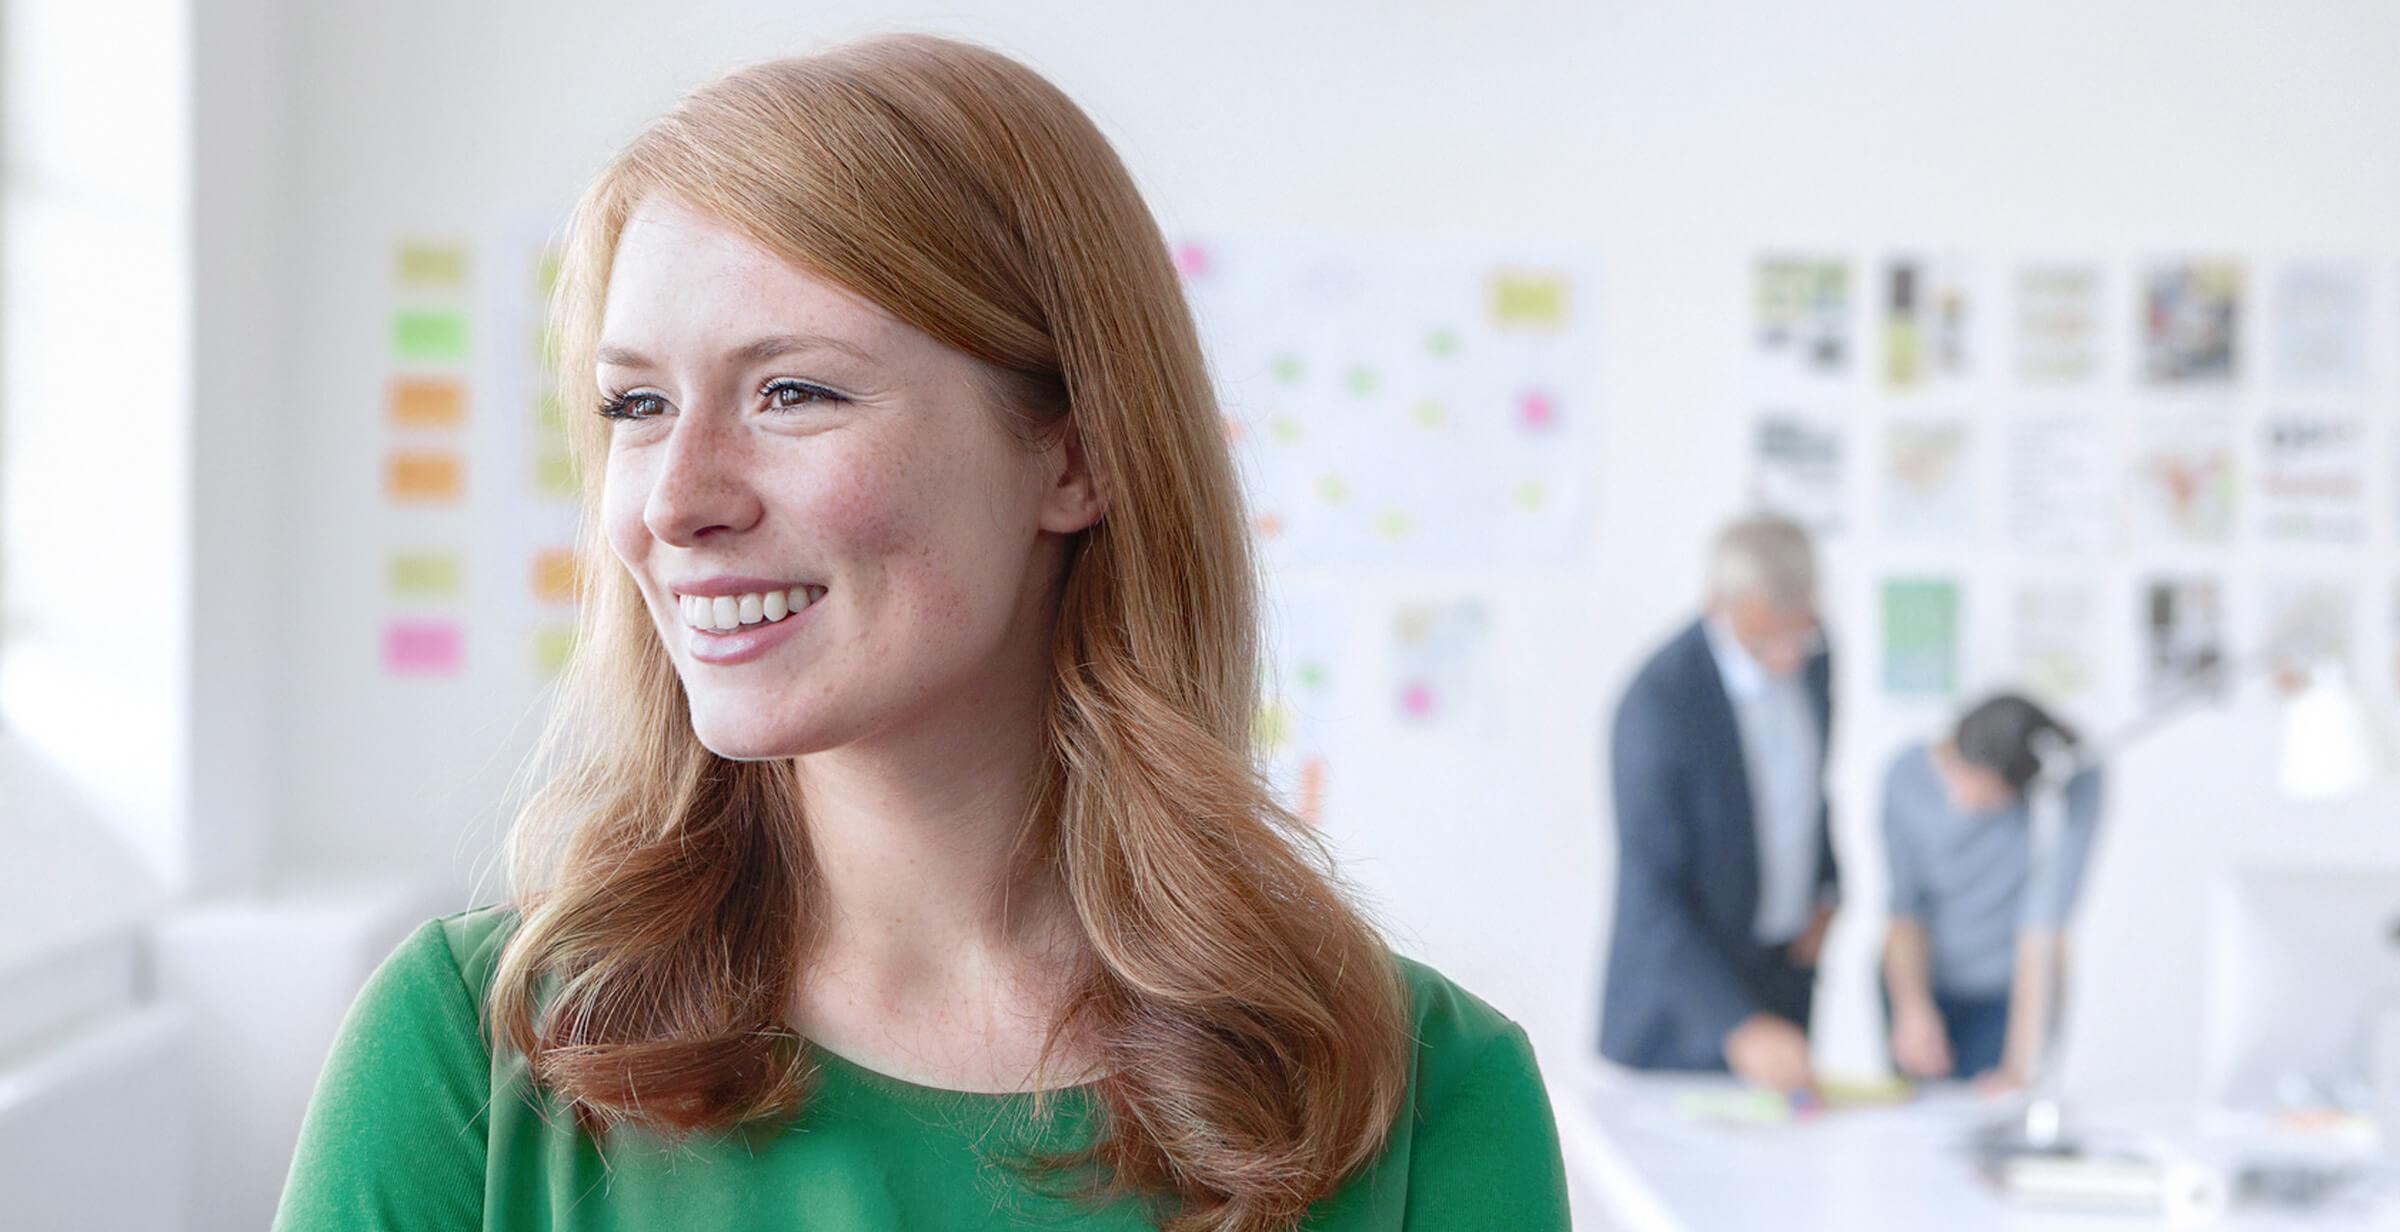 Spokojená investorka a klientka online brokera LYNX